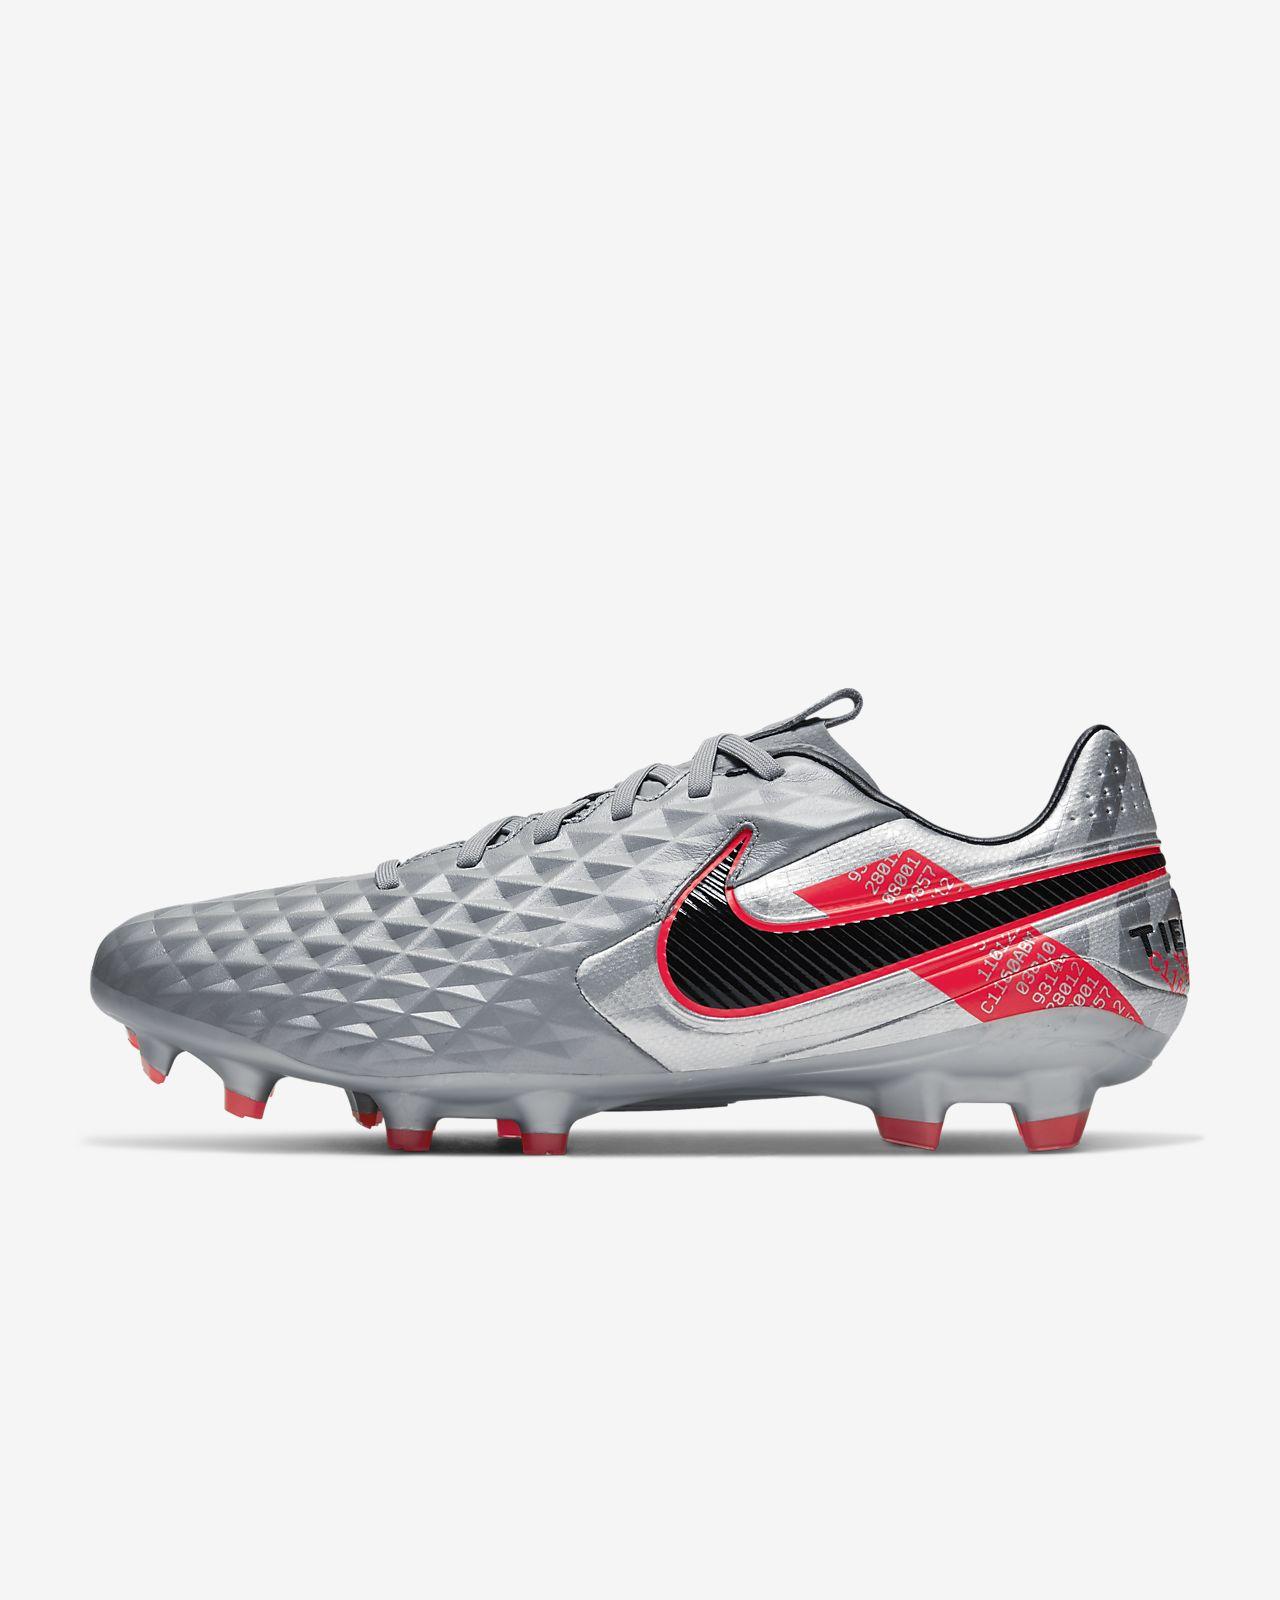 este Pautas reserva  Nike Tiempo Legend 8 Pro FG Firm-Ground Football Boot. Nike LU